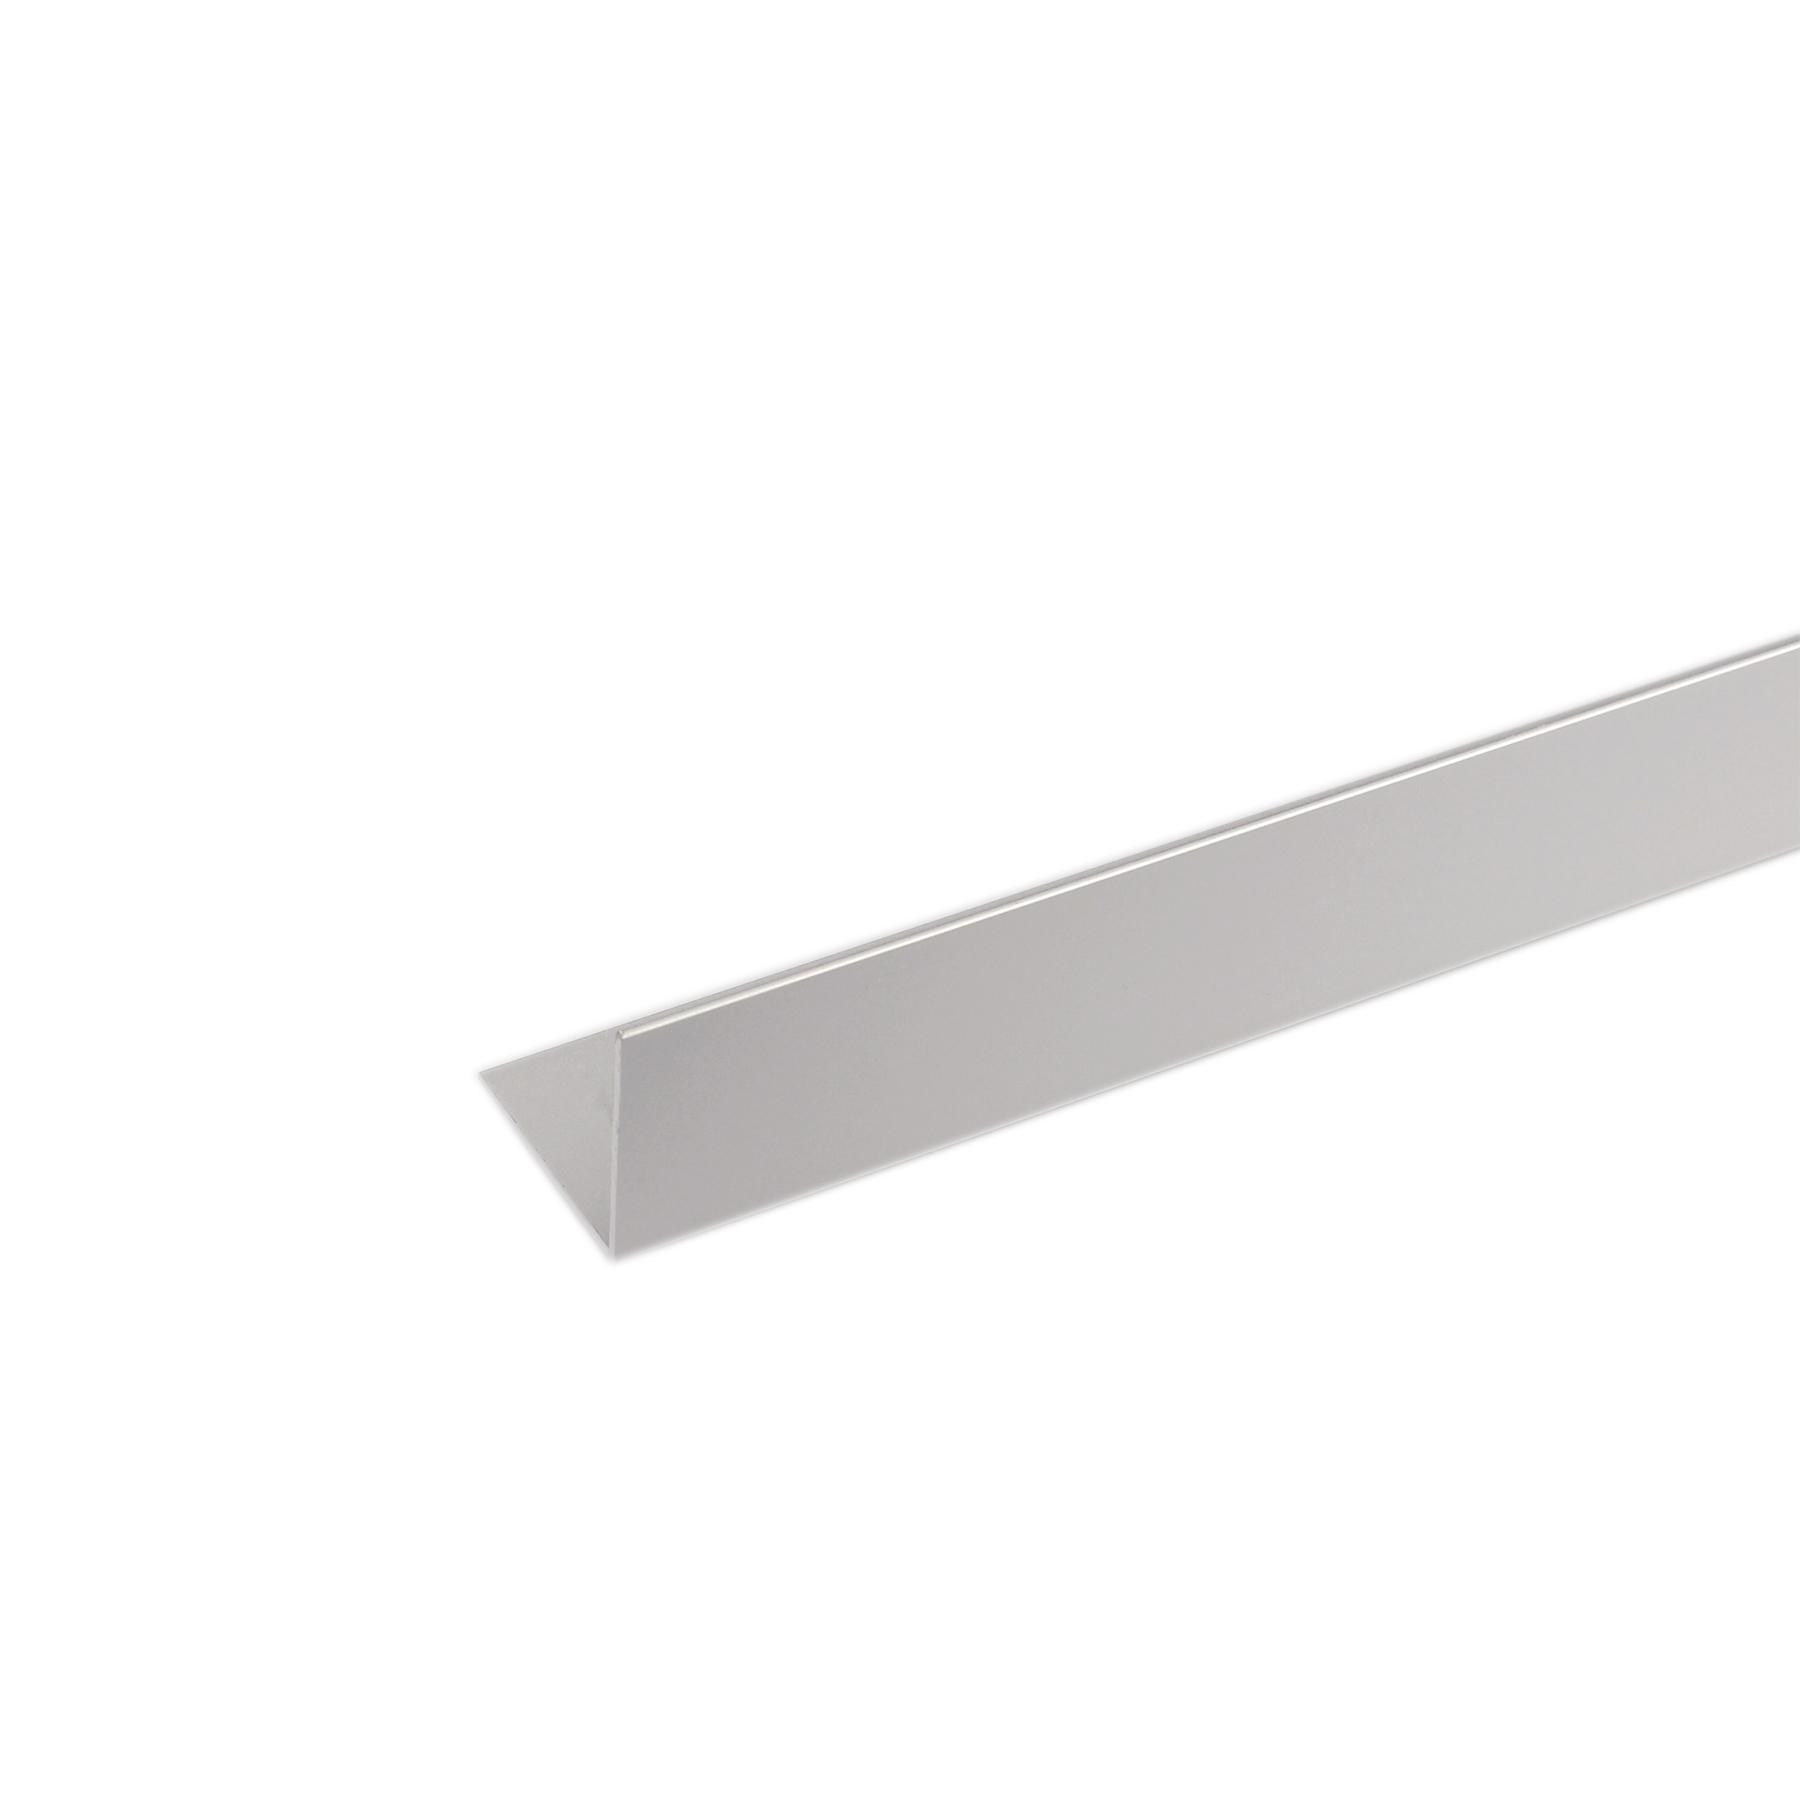 Perfil Canto Alumínio Anodizado 1mx1,5cm